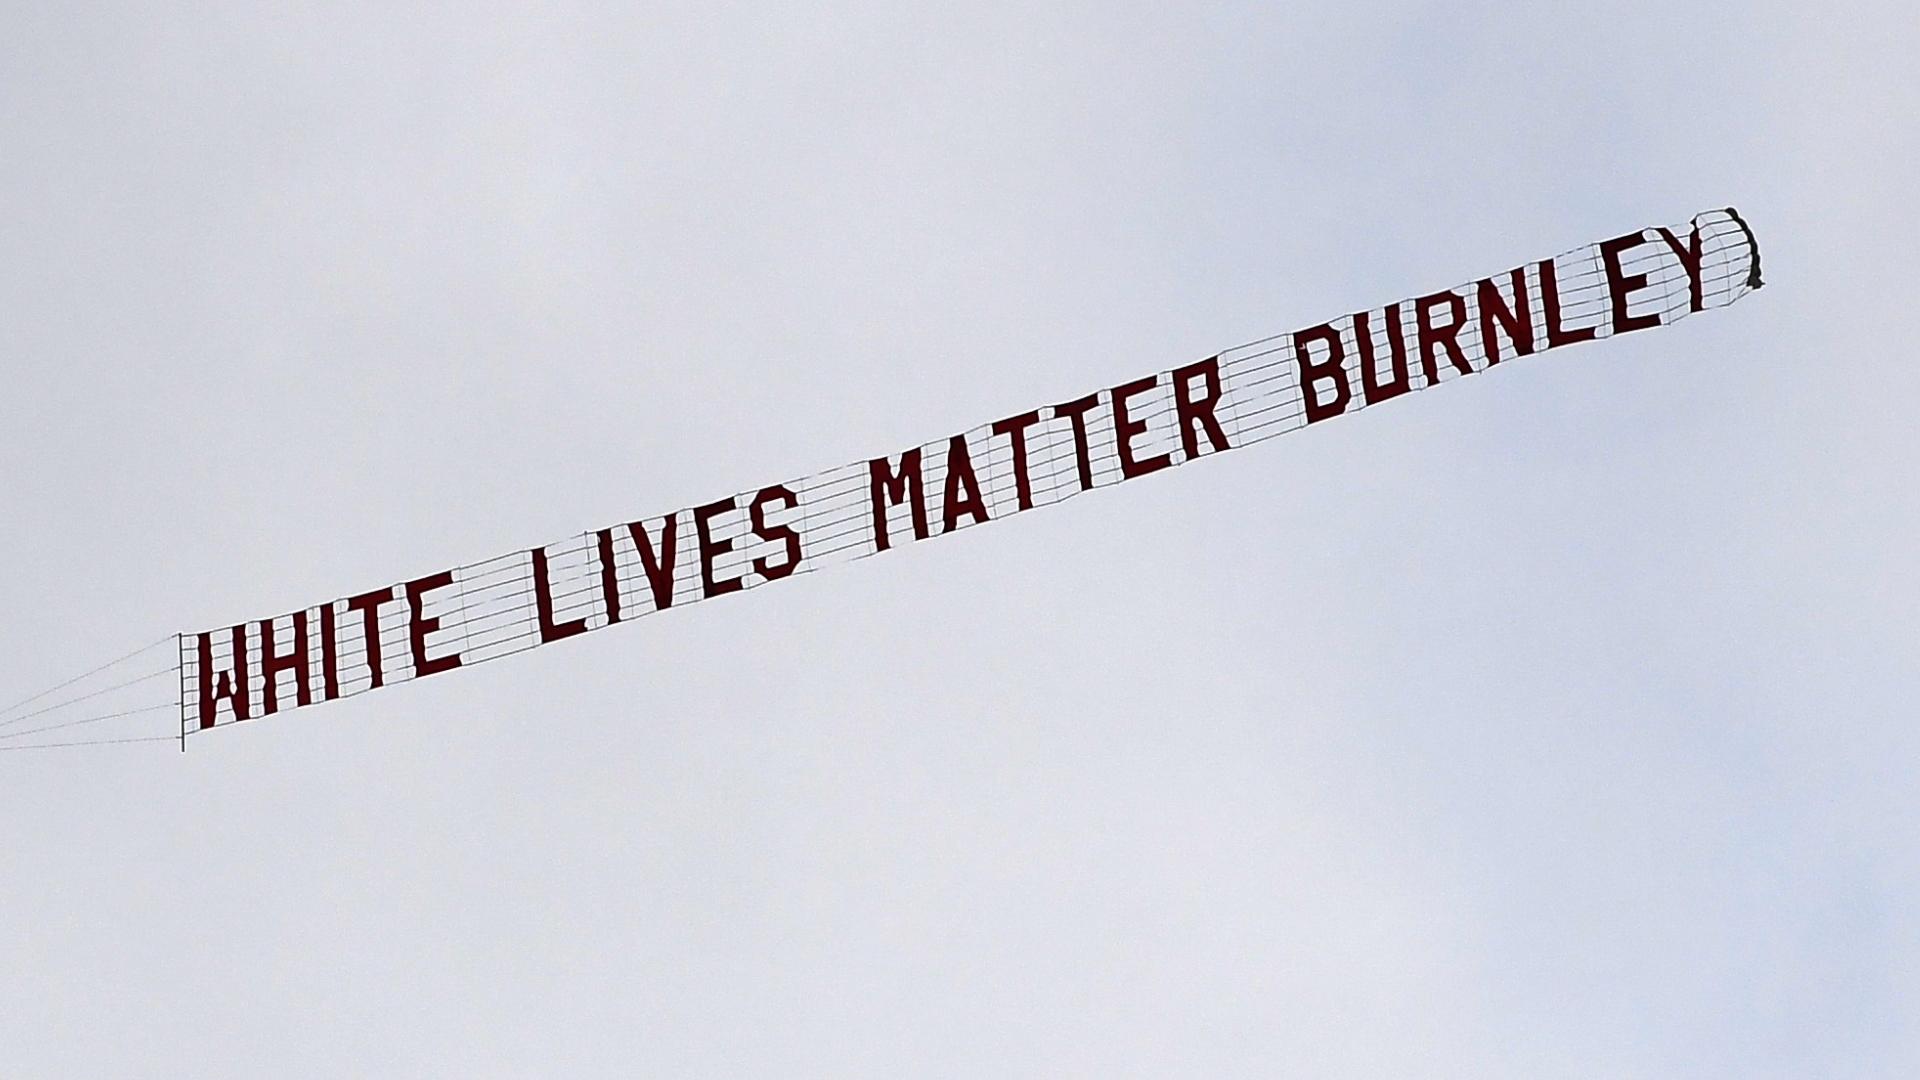 White Lives Matter plane